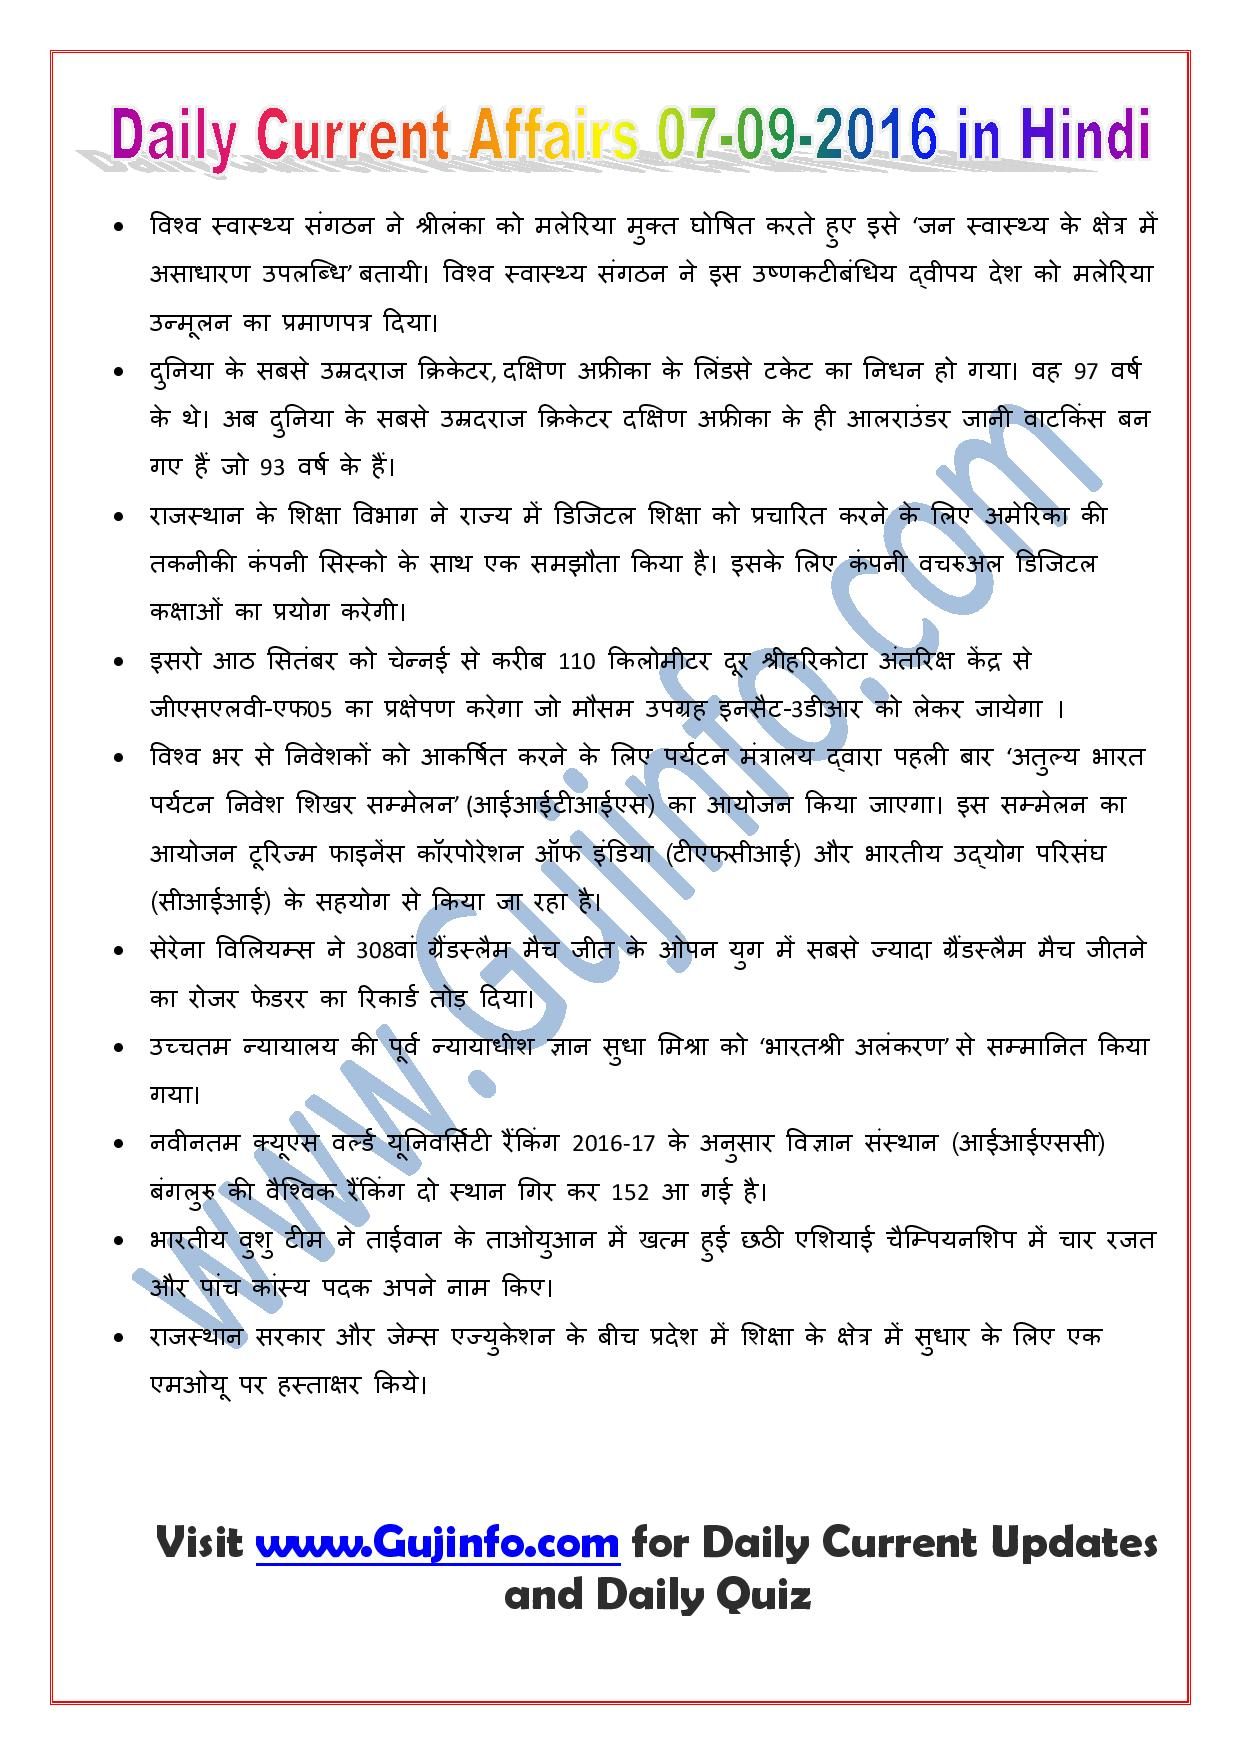 rajasthan current affairs 2016 in hindi pdf file free download